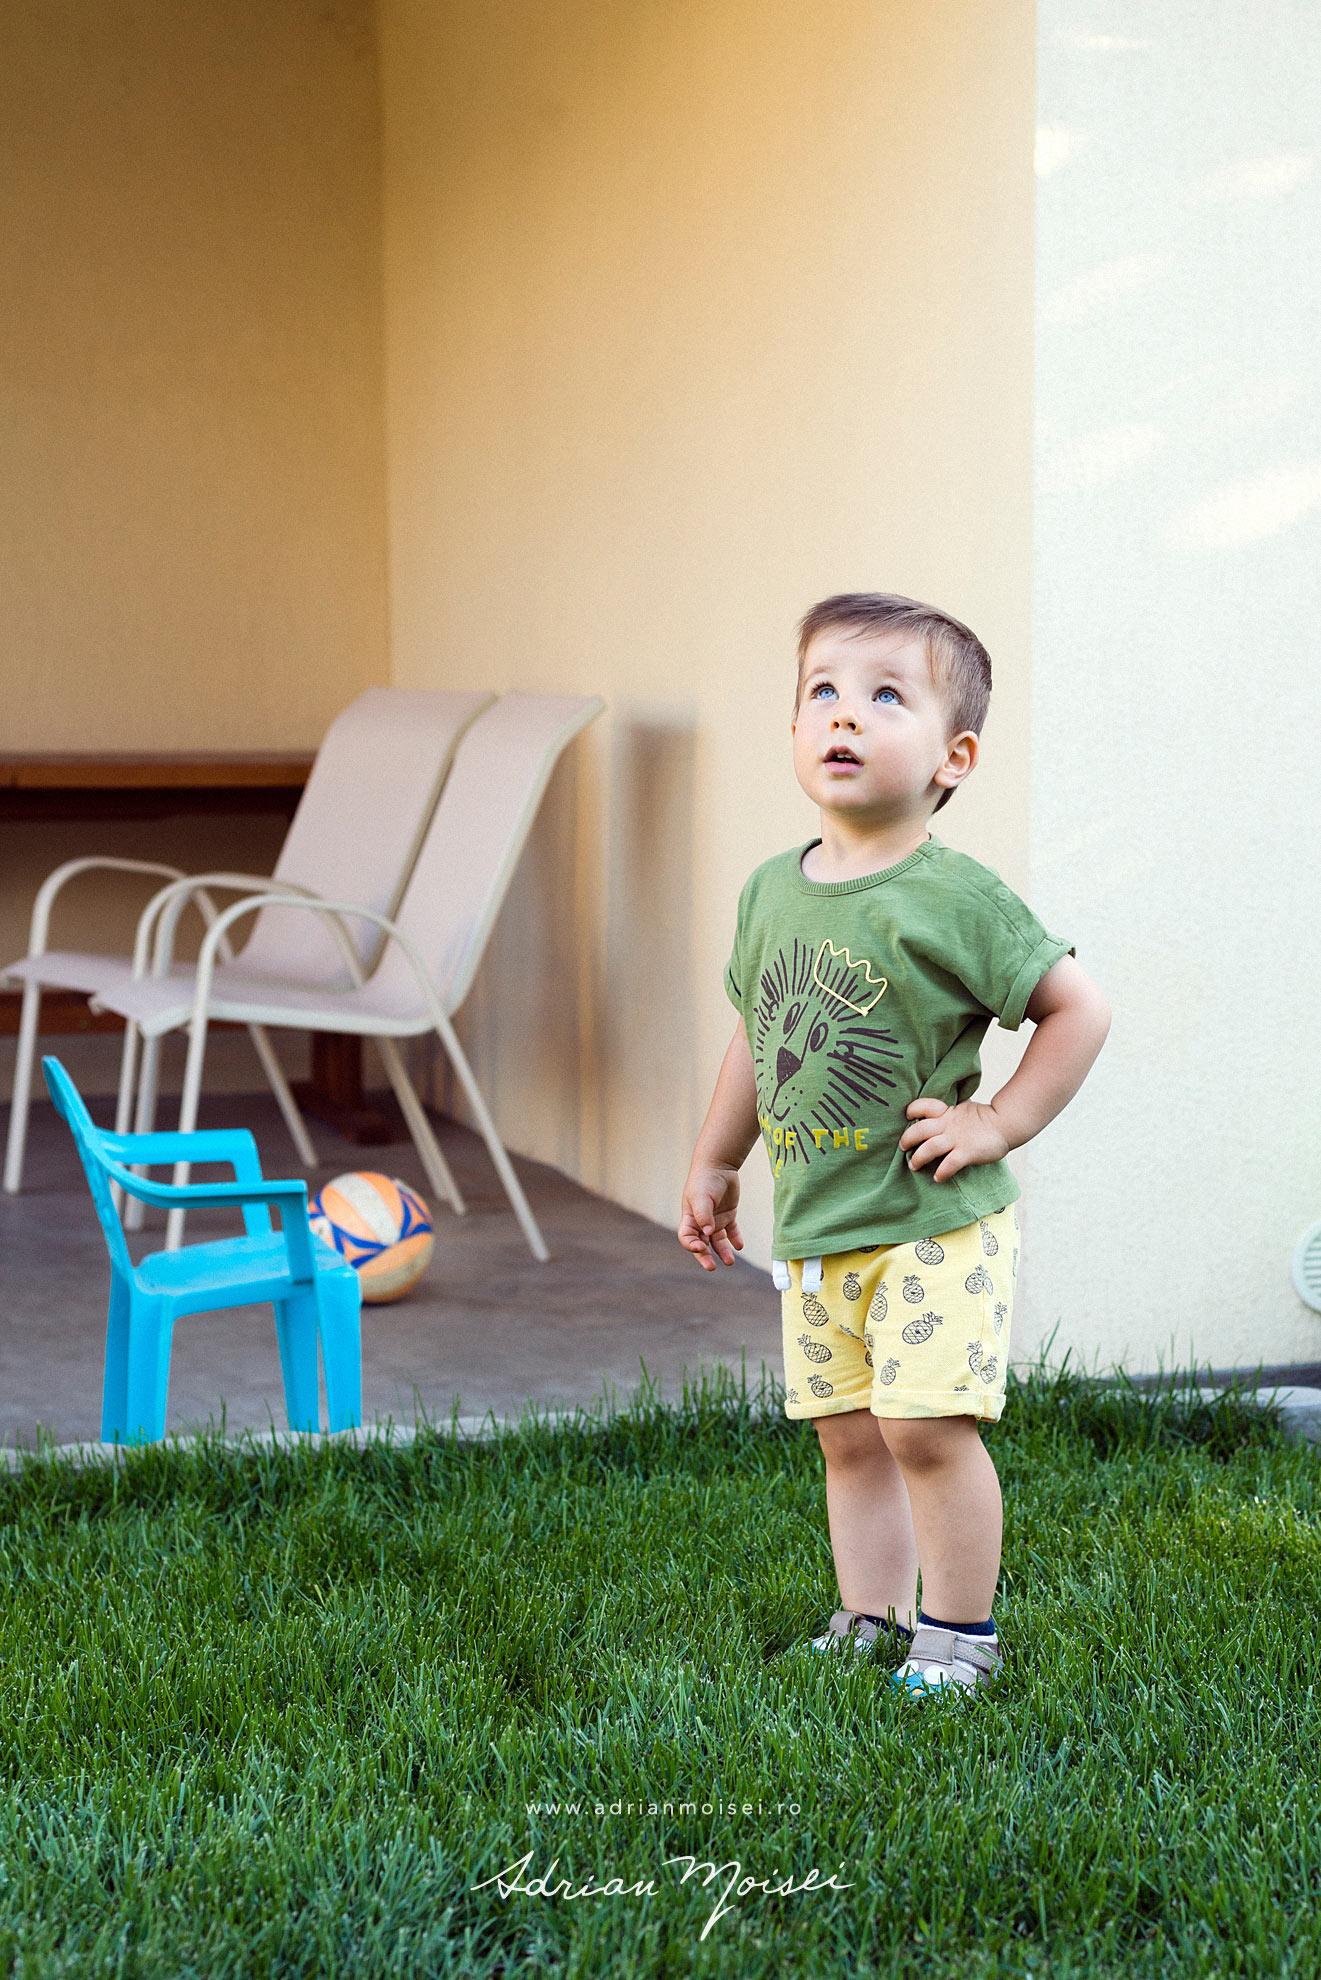 Fotograf familie in Iași. Fotografie bebelusi și copii. Fotograf profesionist Iasi, Adrian Moisei